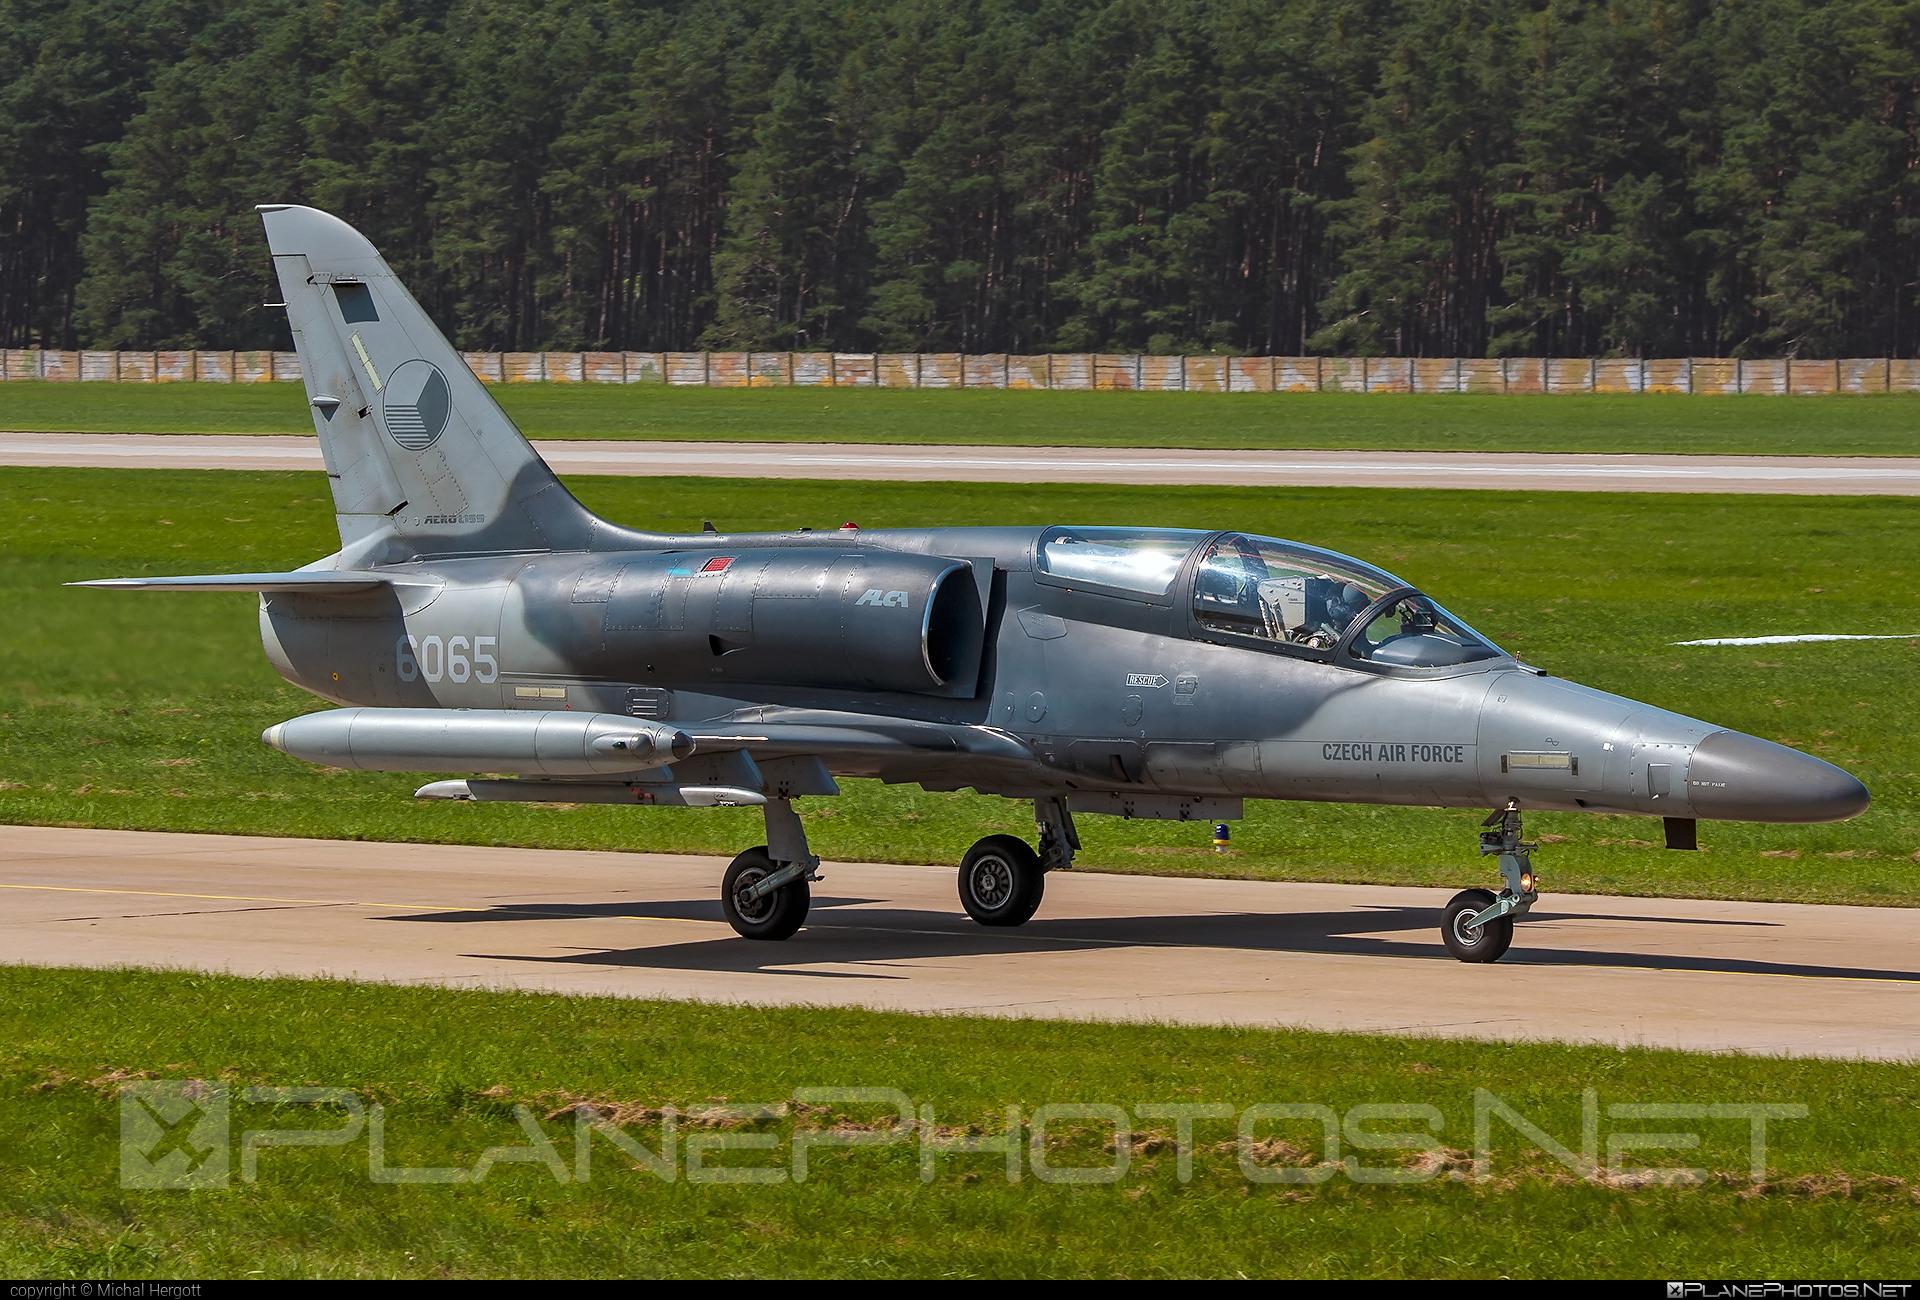 Aero L-159A Alca - 6065 operated by Vzdušné síly AČR (Czech Air Force) #aero #aerol159 #aerol159aalca #aerol159alca #czechairforce #l159 #l159a #l159aalca #l159alca #siaf2021 #vzdusnesilyacr